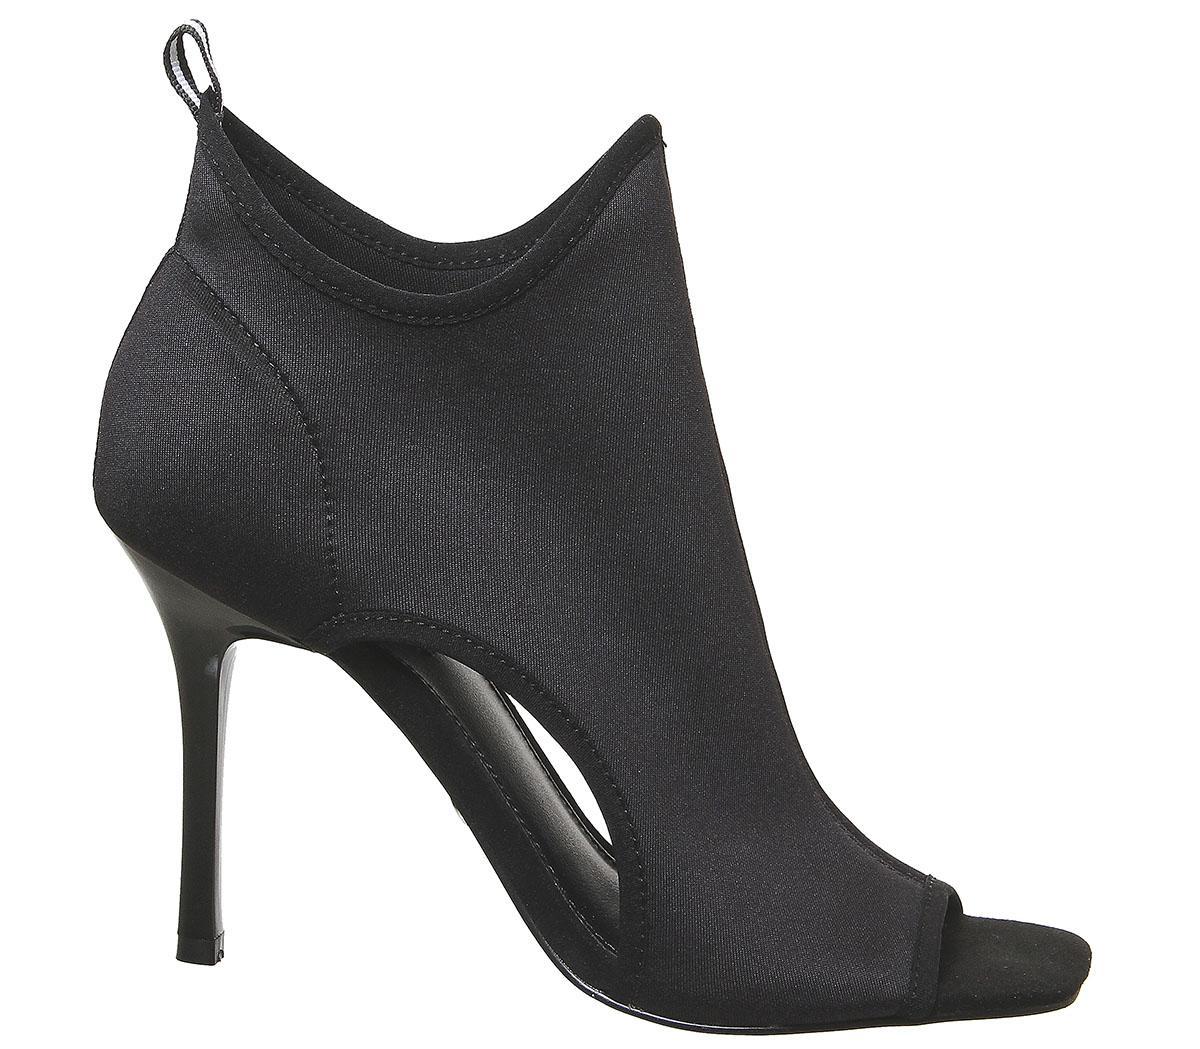 Office Home Run Sports Shoe Boots Black Neoprene White